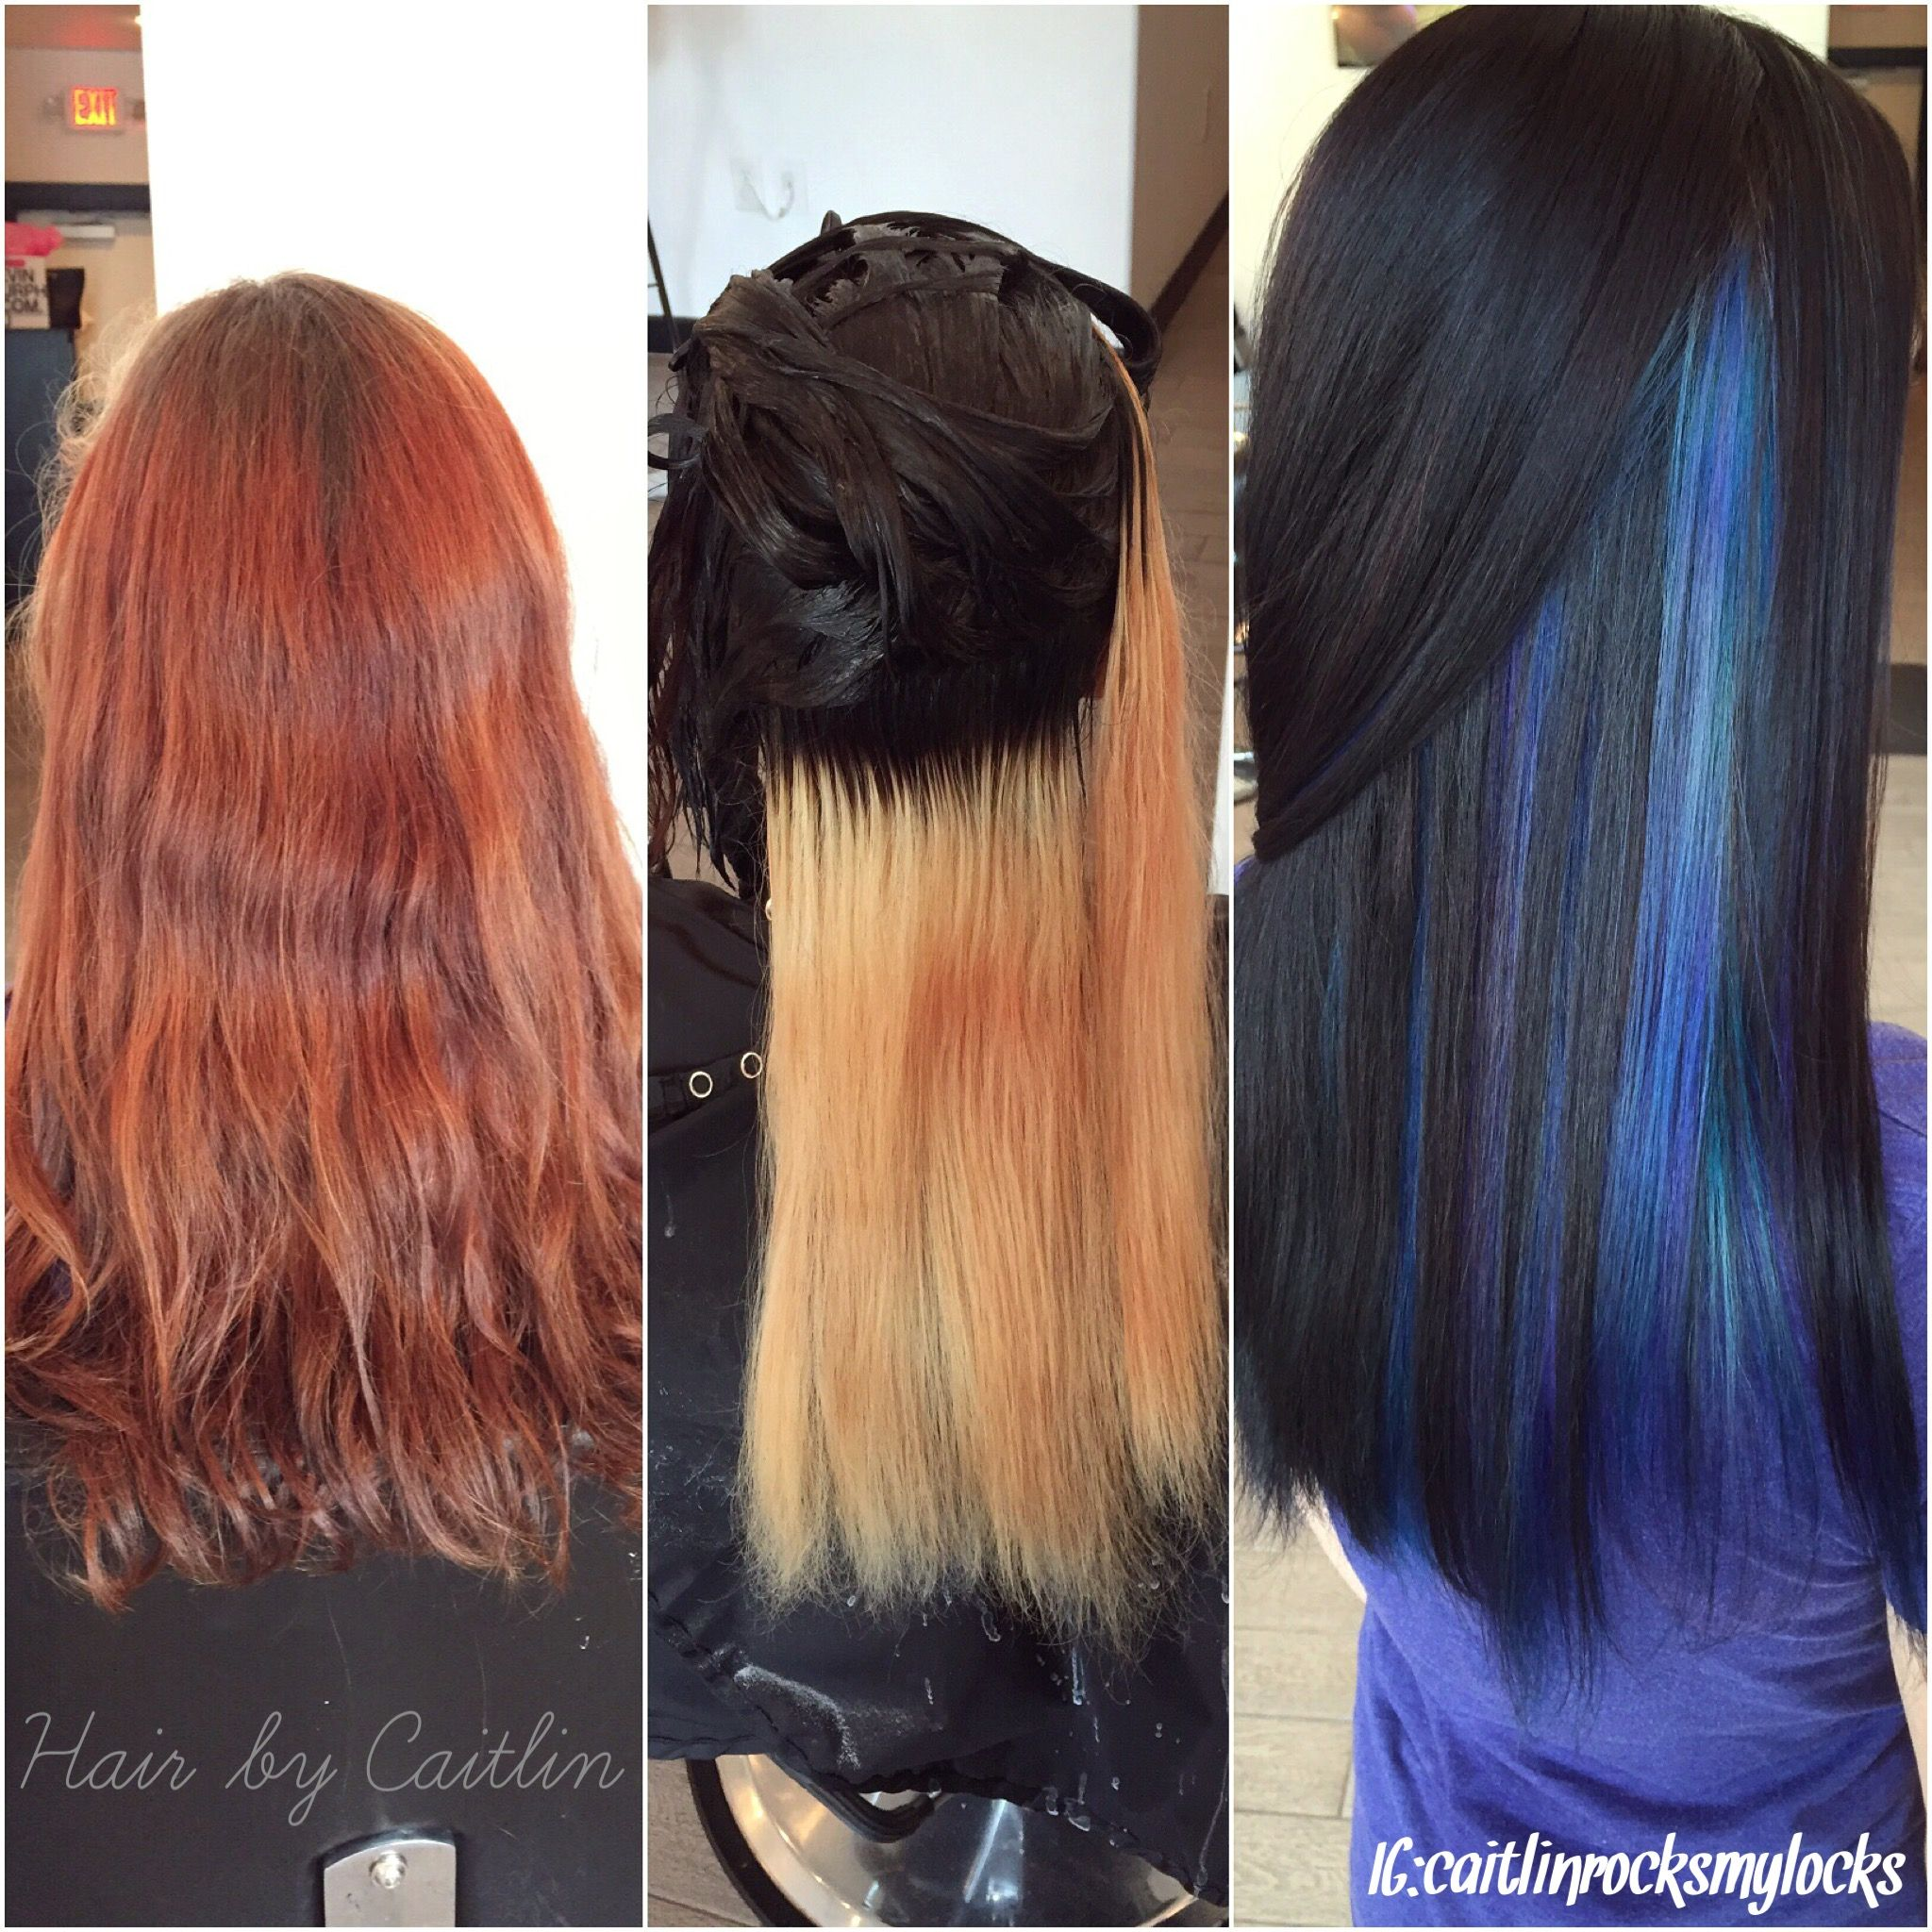 Underlights Hair process Start to 1st process to finish Purple